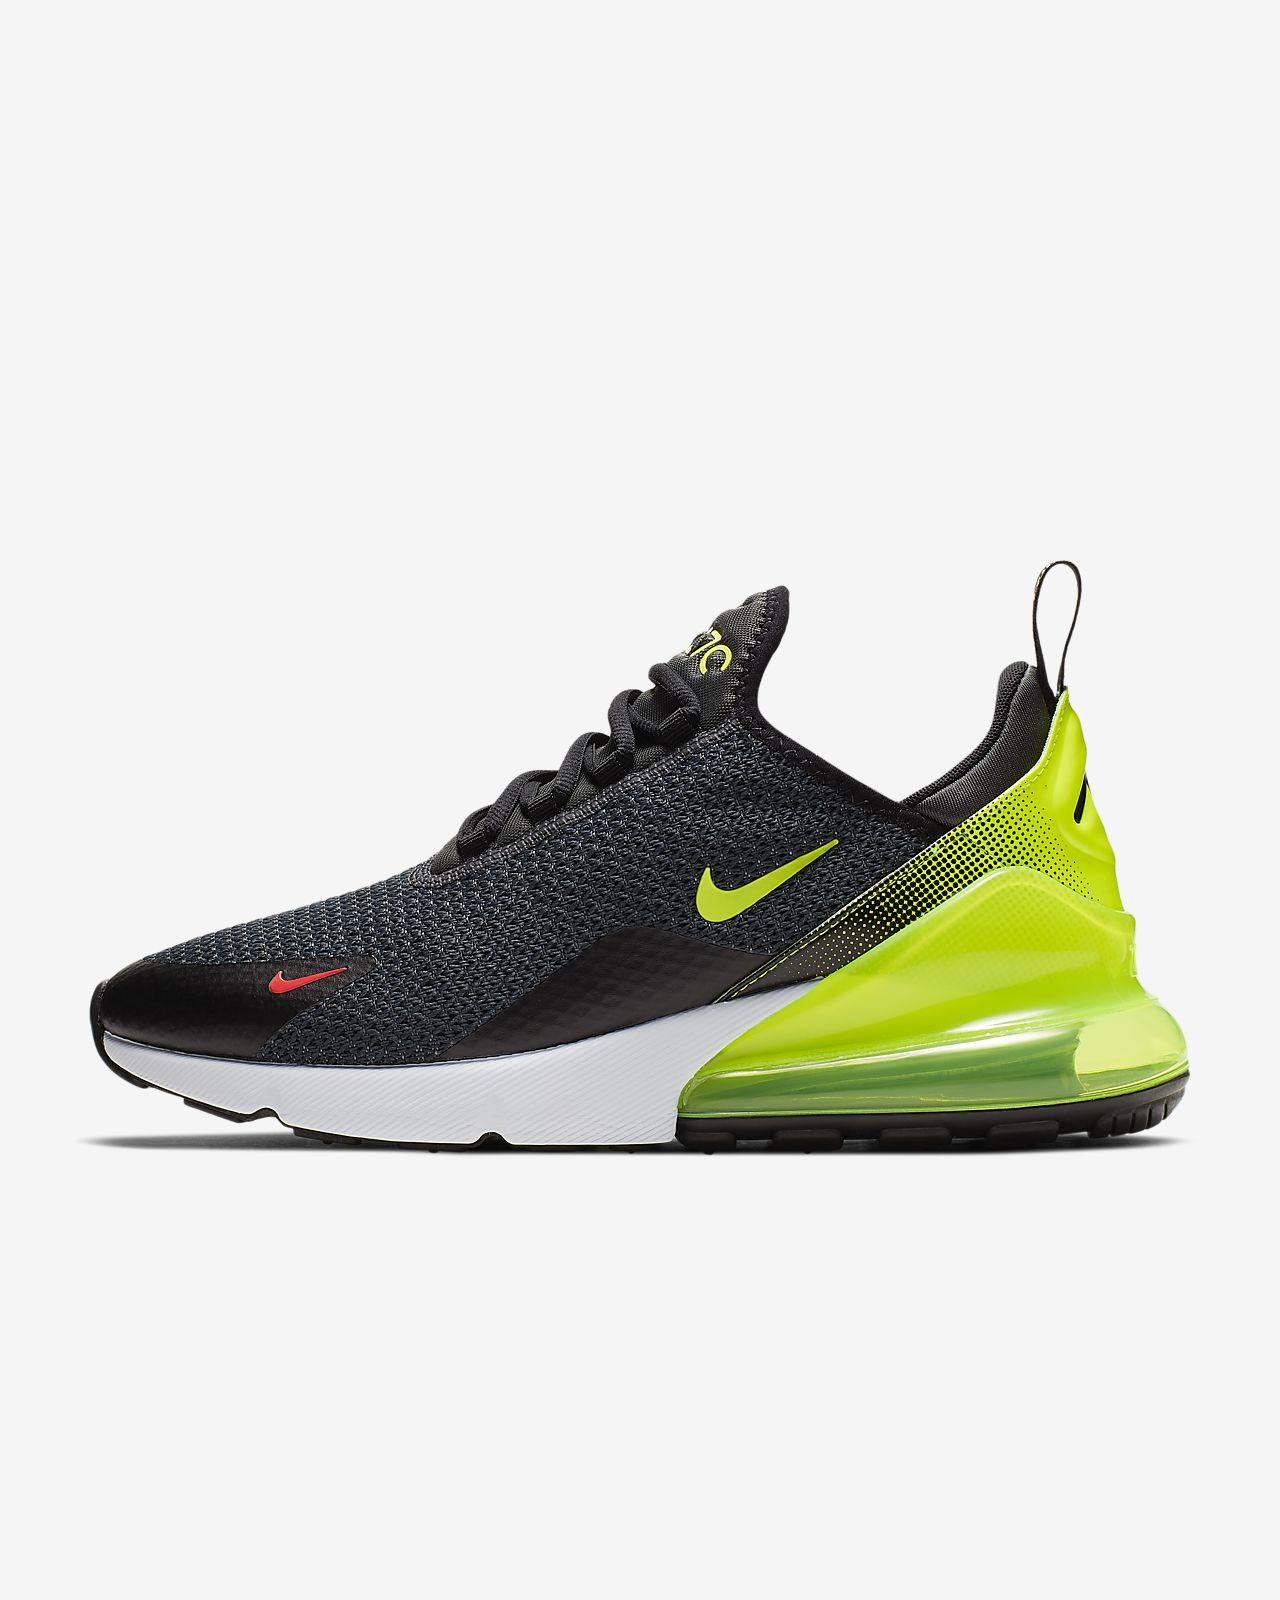 be57edf6 Мужские кроссовки Nike Air Max 270 SE. Nike.com RU